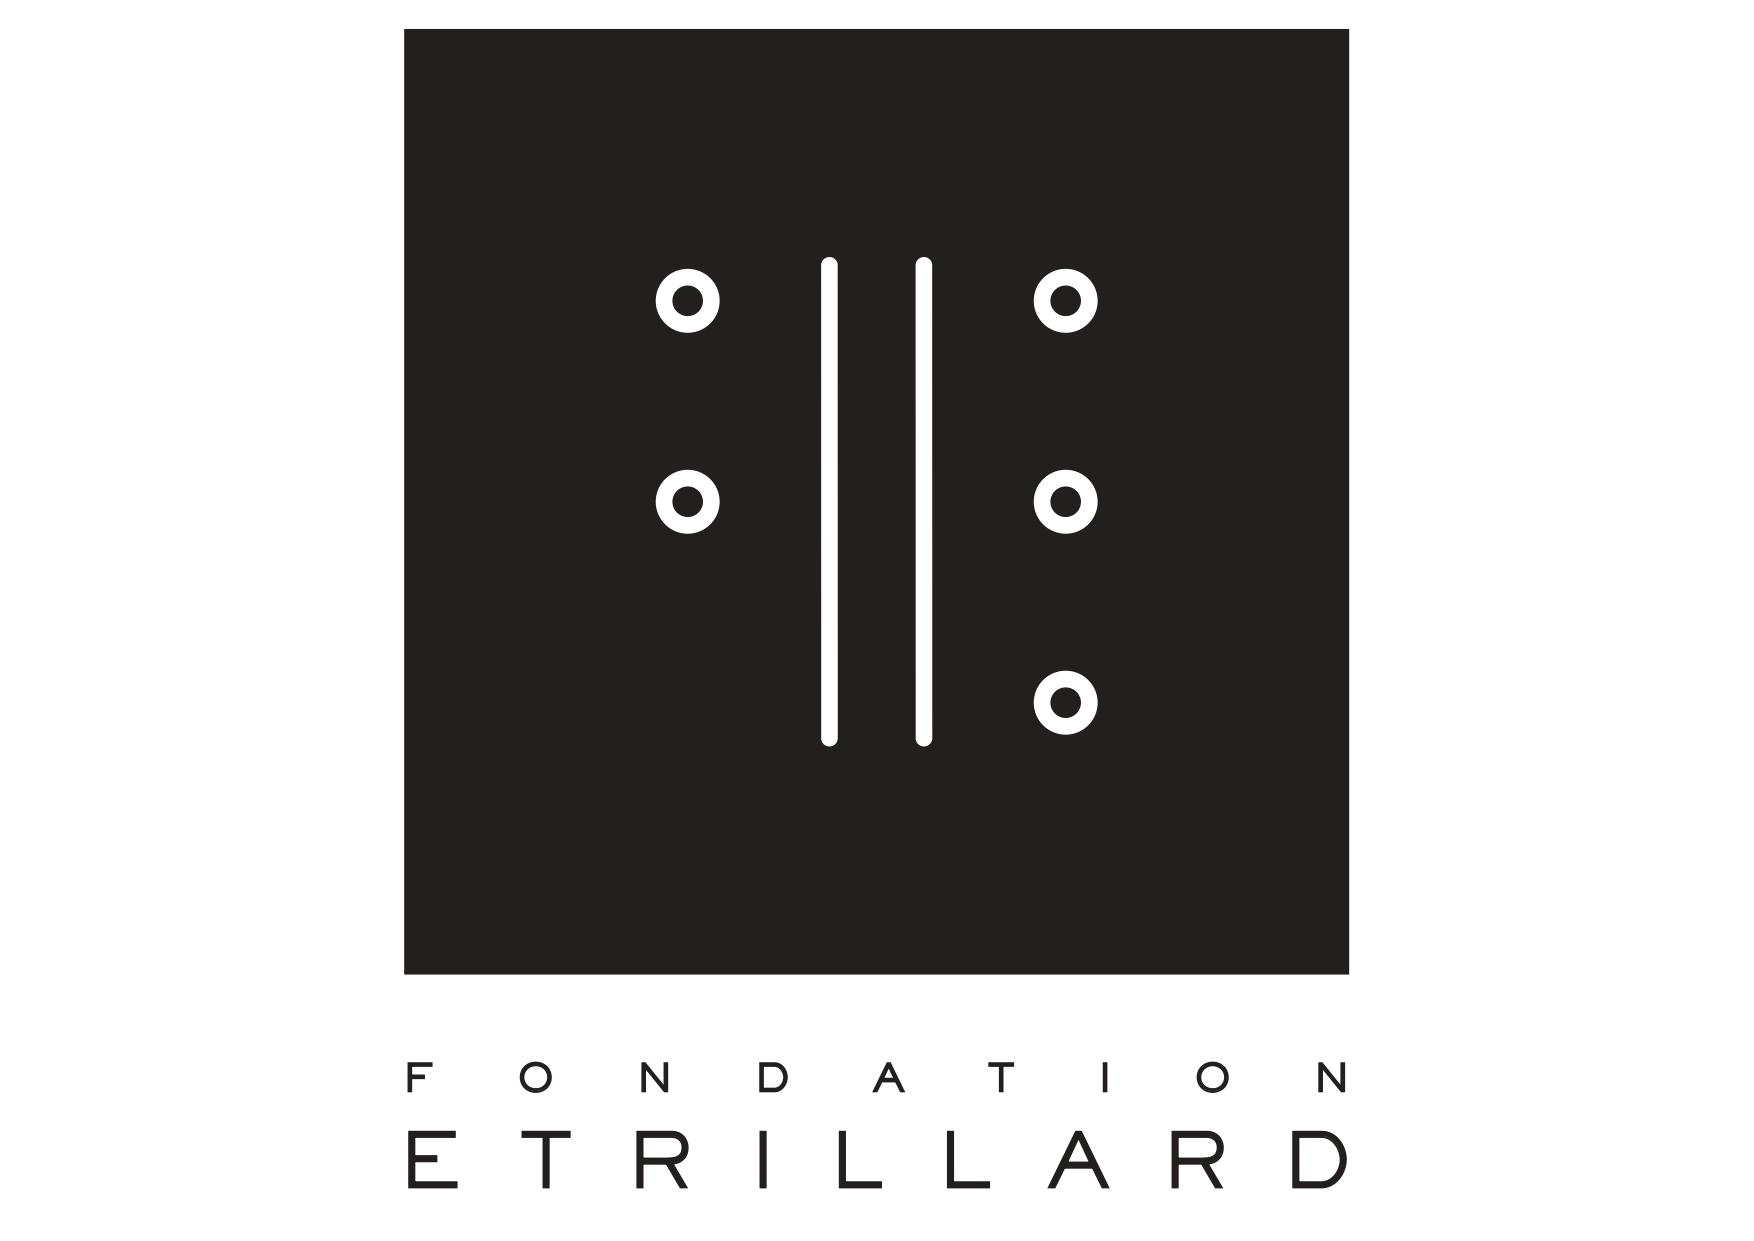 LOGO Fondation Etrillard COMPLET[305]_page-0001